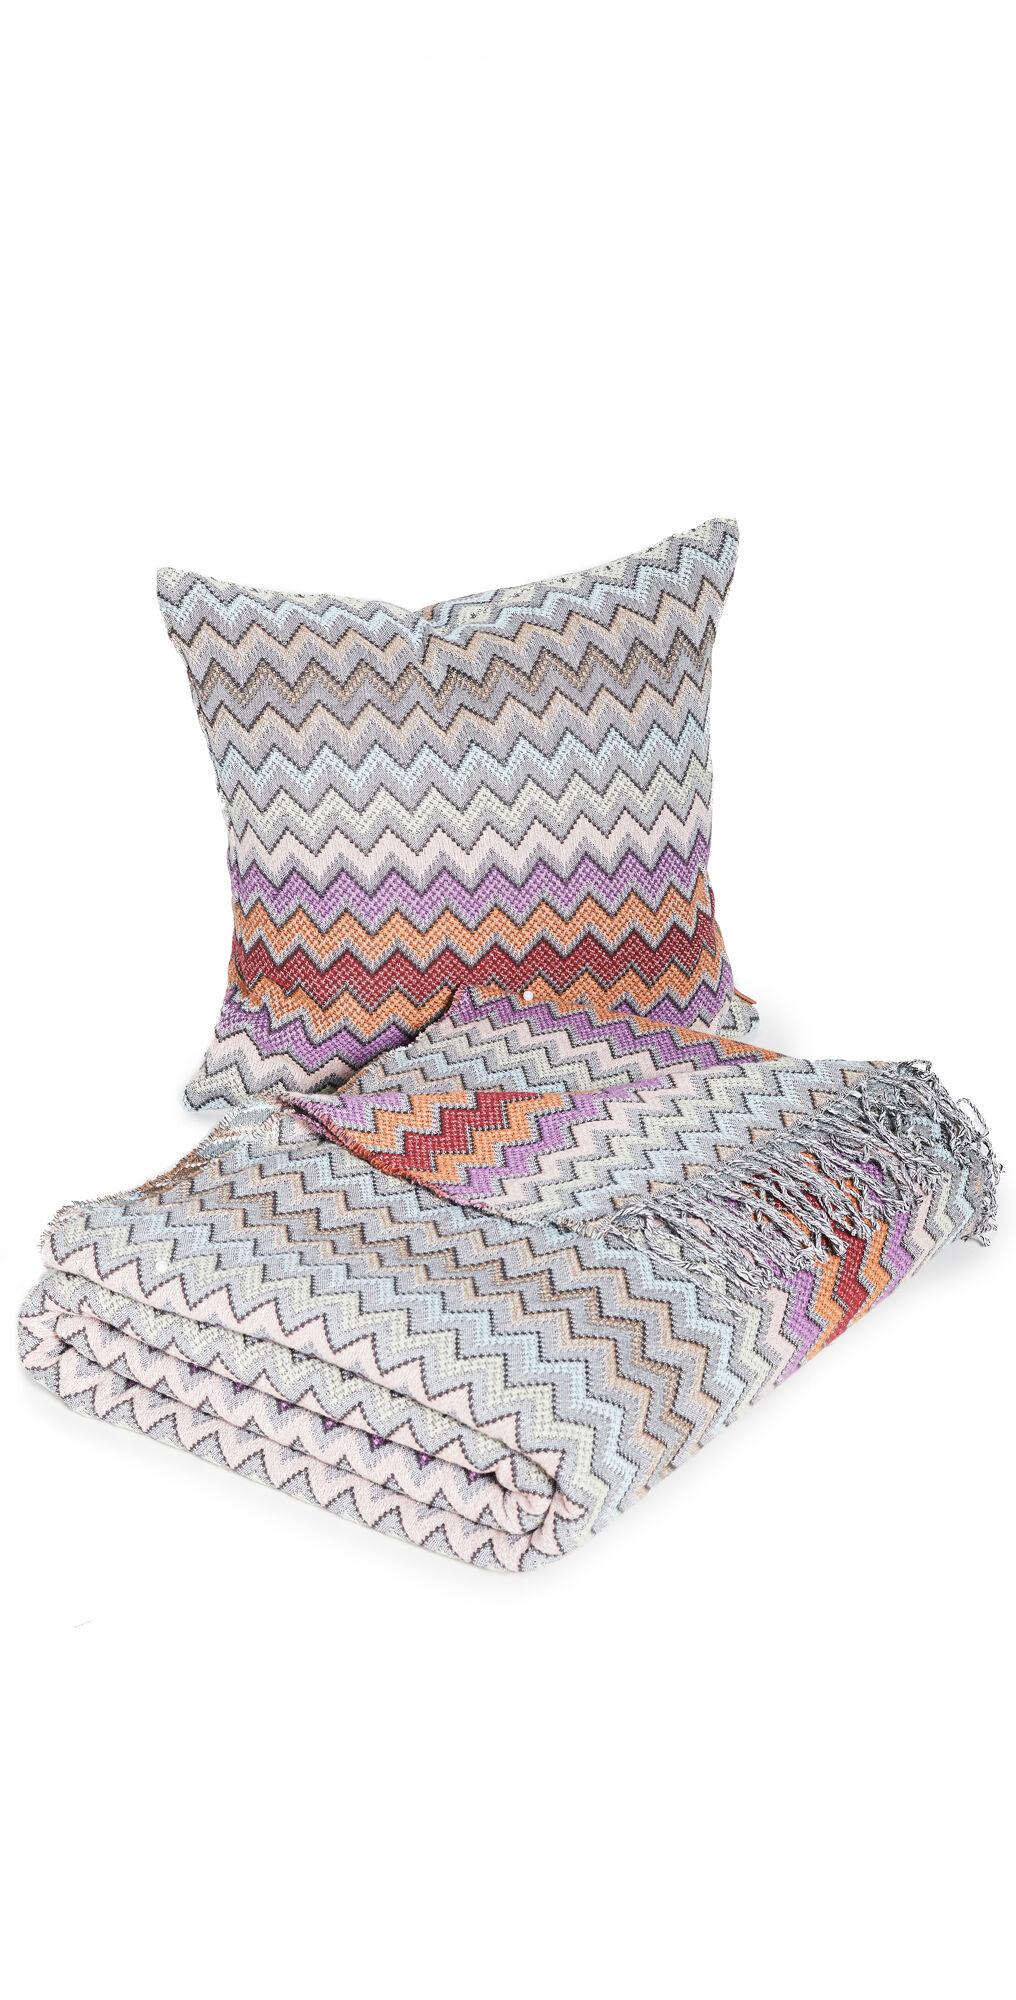 Missoni Home William Throw + Cushion Set  - 159 - Size: One Size